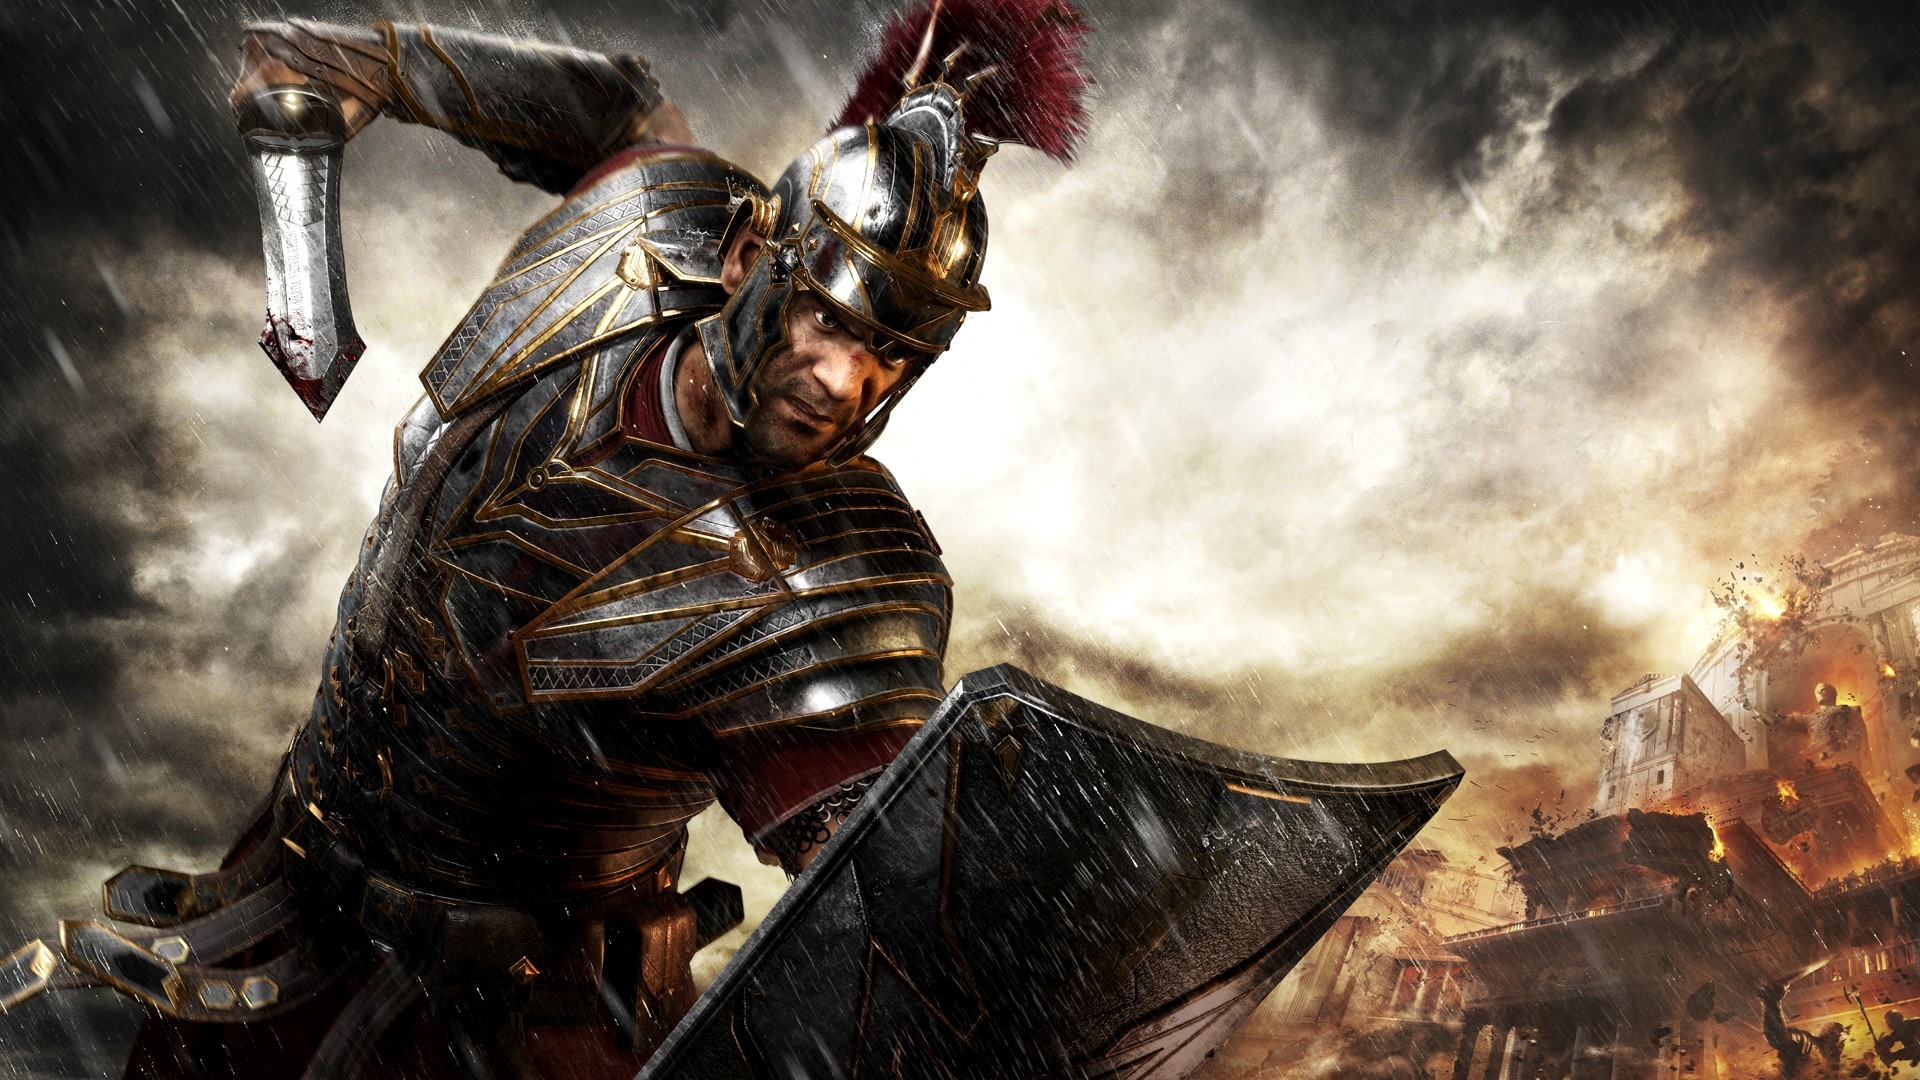 roman gladiator wallpaper 81 images